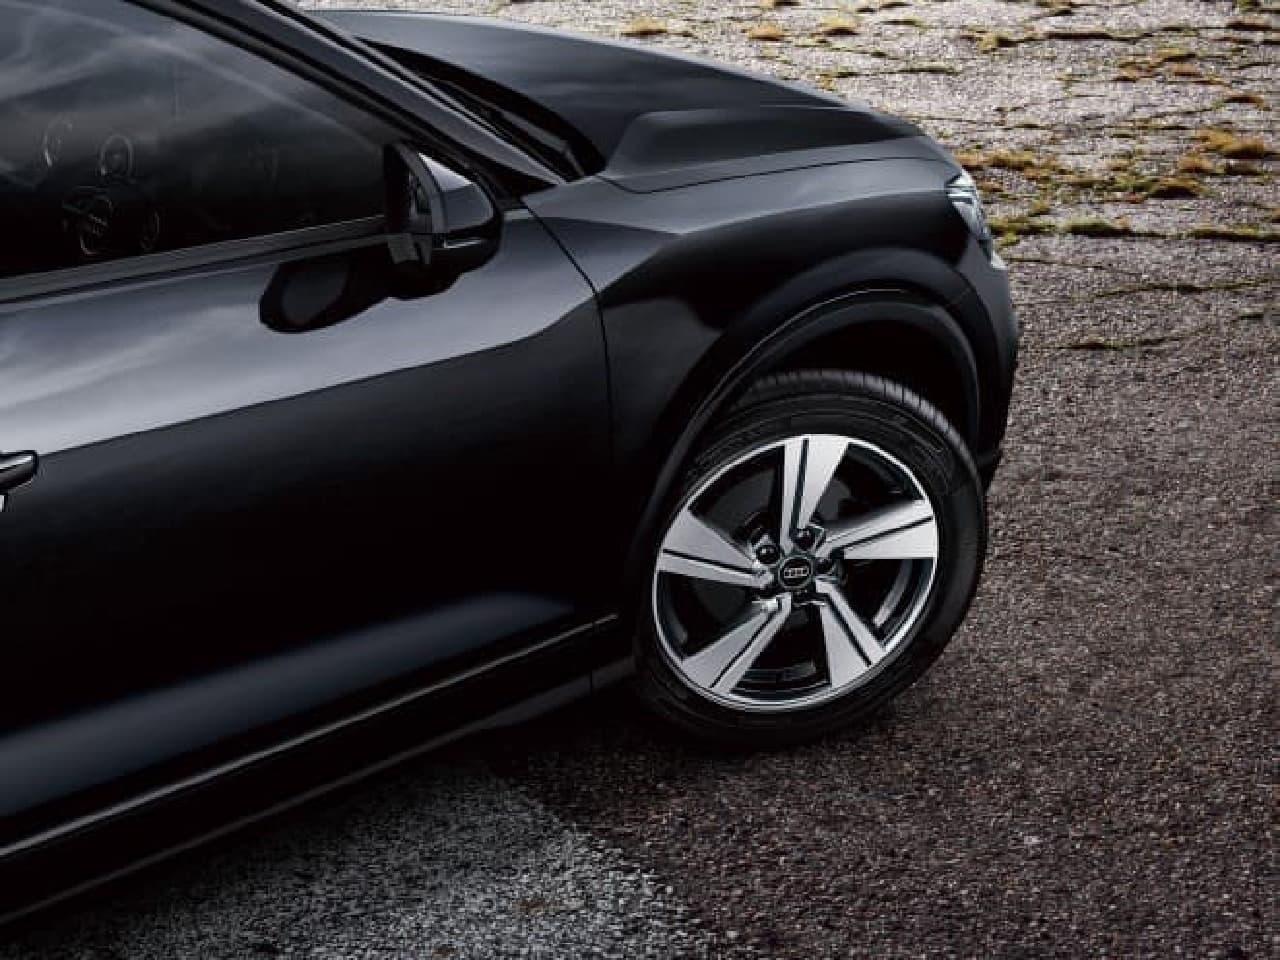 「Audi Q2」に、ロングドライブをテーマにした限定車「Audi Q2 #touring limited」